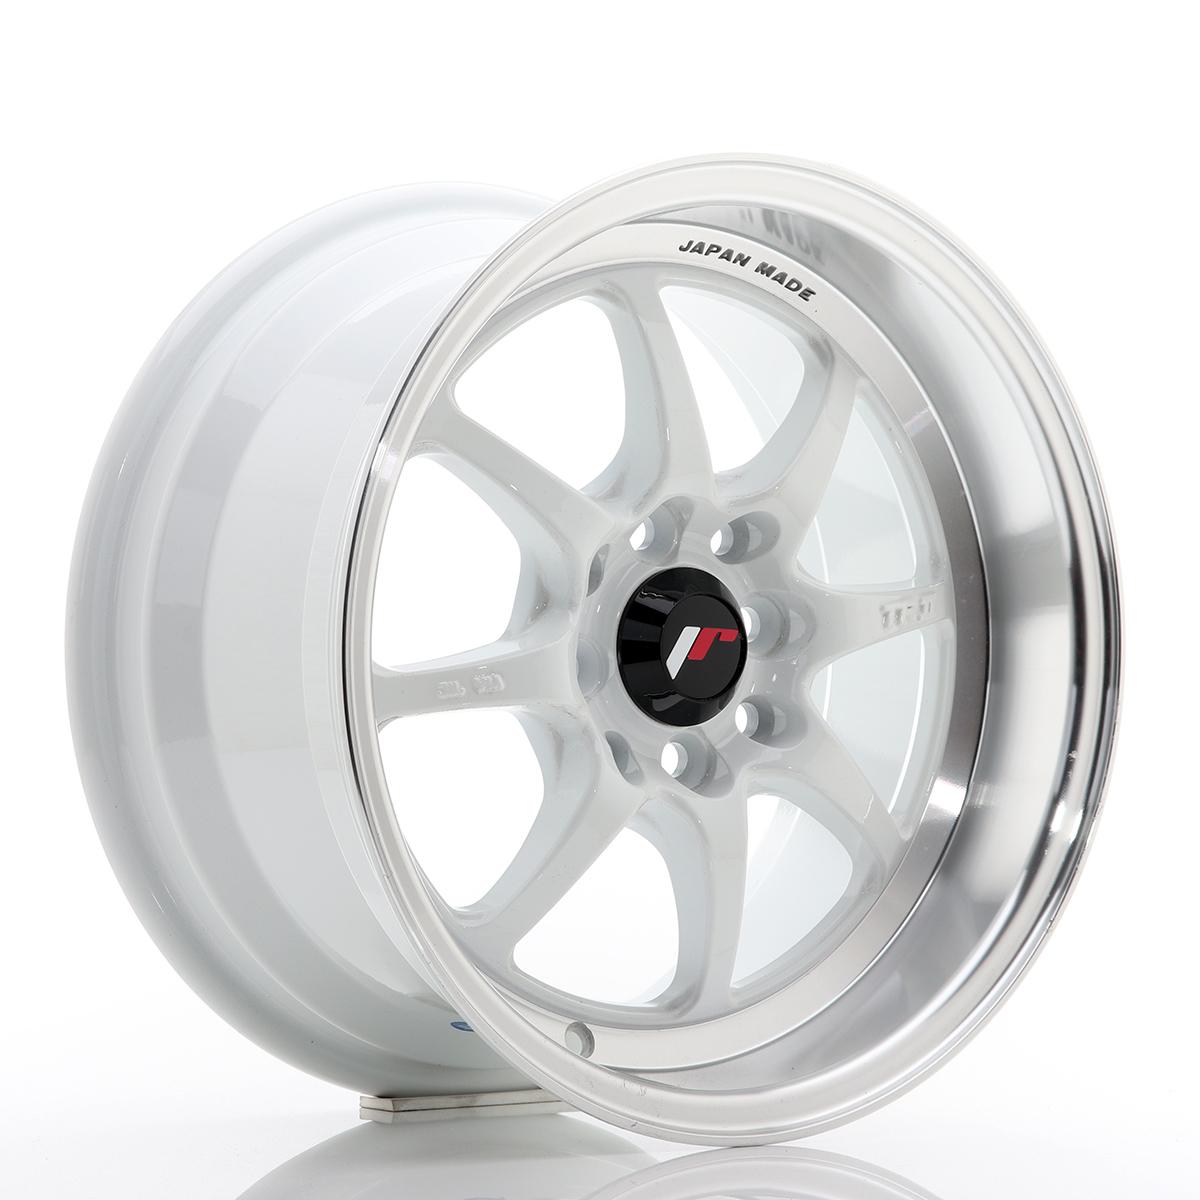 JAPAN RACING TFII 15x7.5 4x114.3 White - GRUBYGARAGE - Sklep Tuningowy